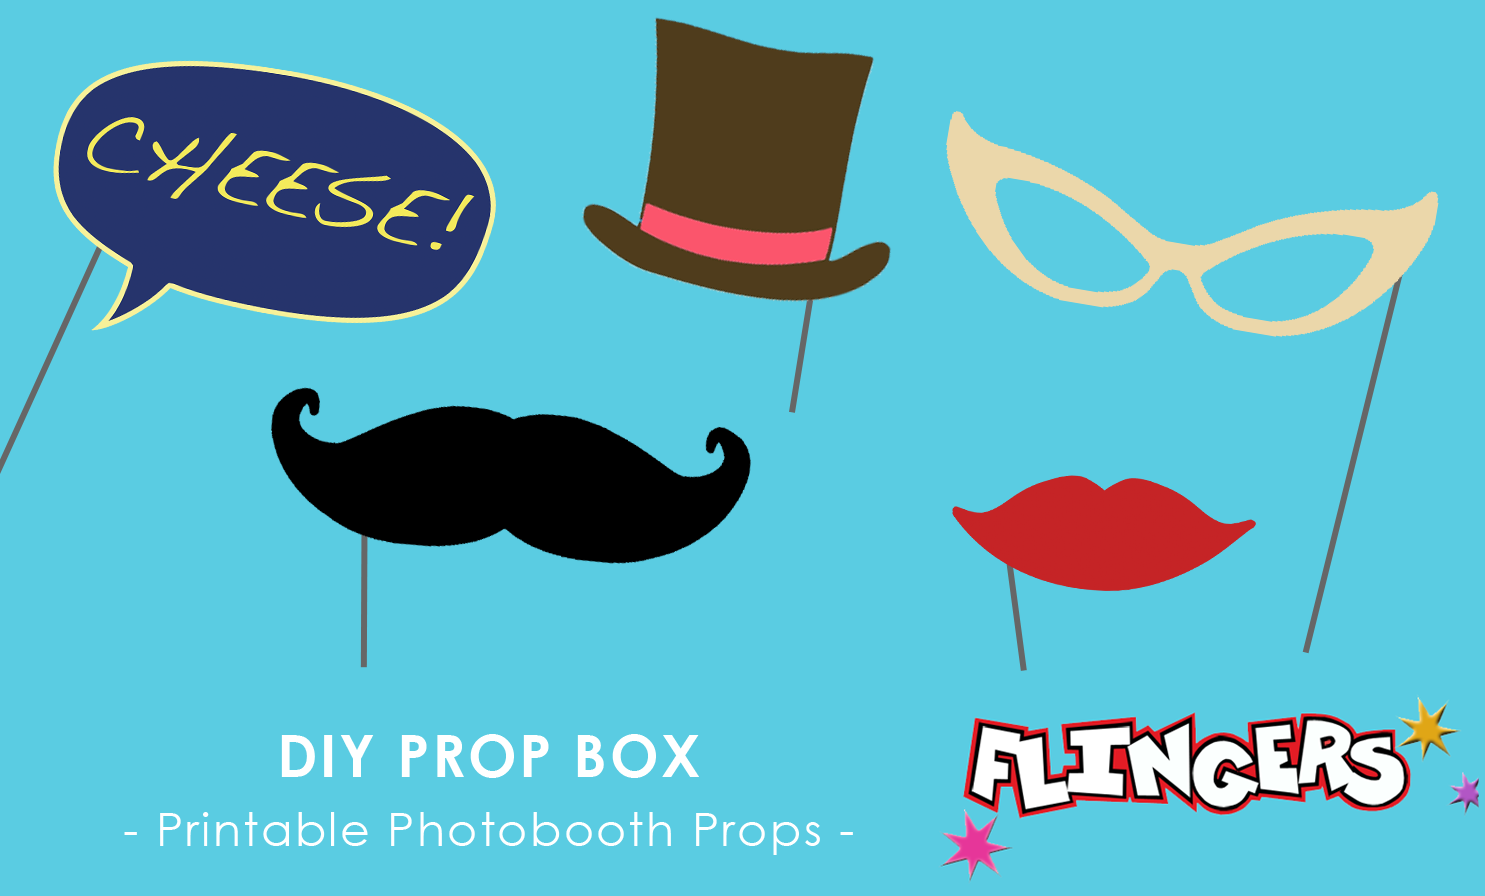 Flingers Party Shop Blog Diy Photobooth Props